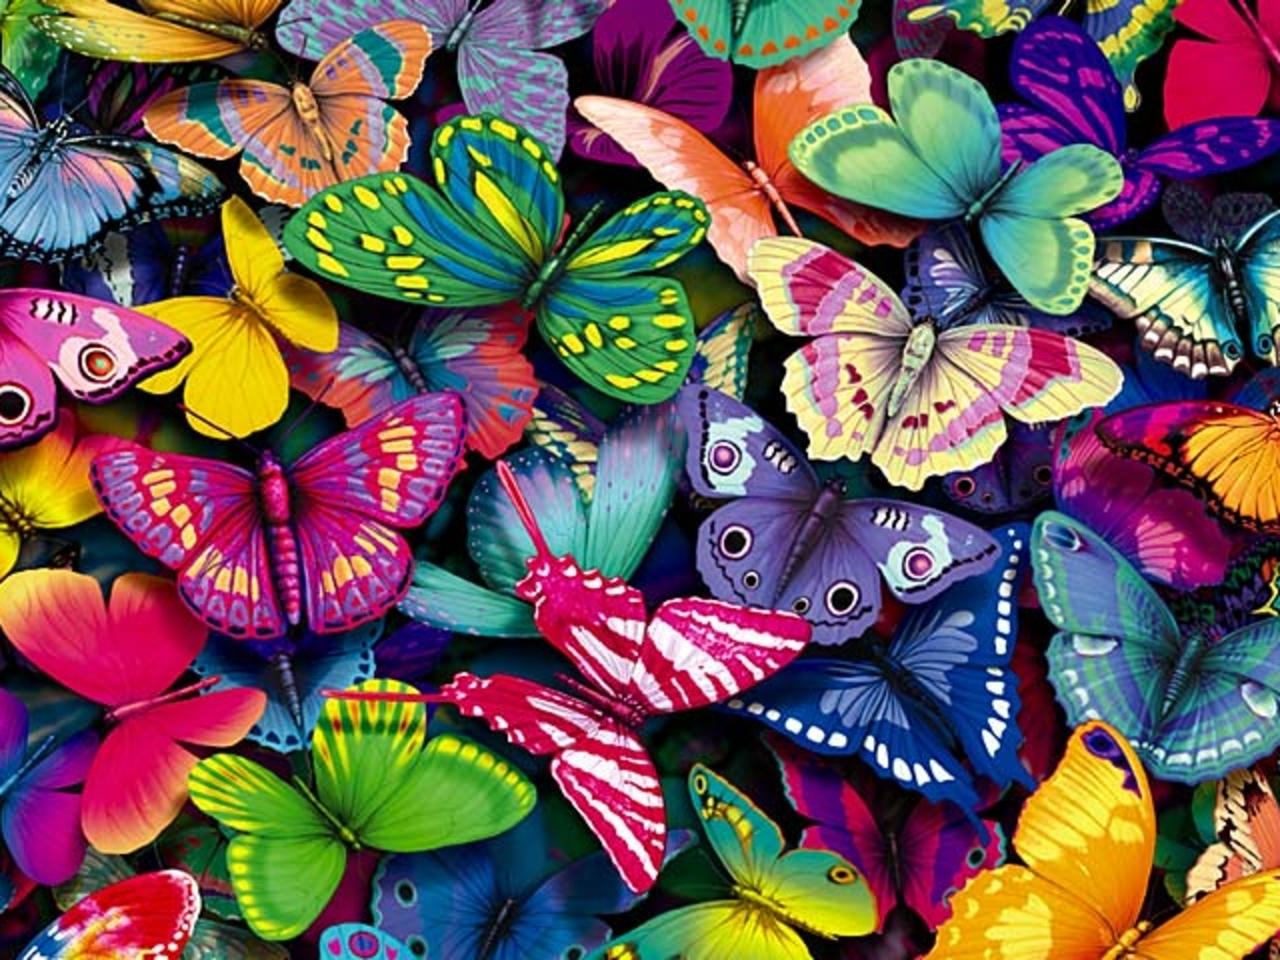 yorkshire rose images Butterflies wallpaper photos 15990936 1280x960